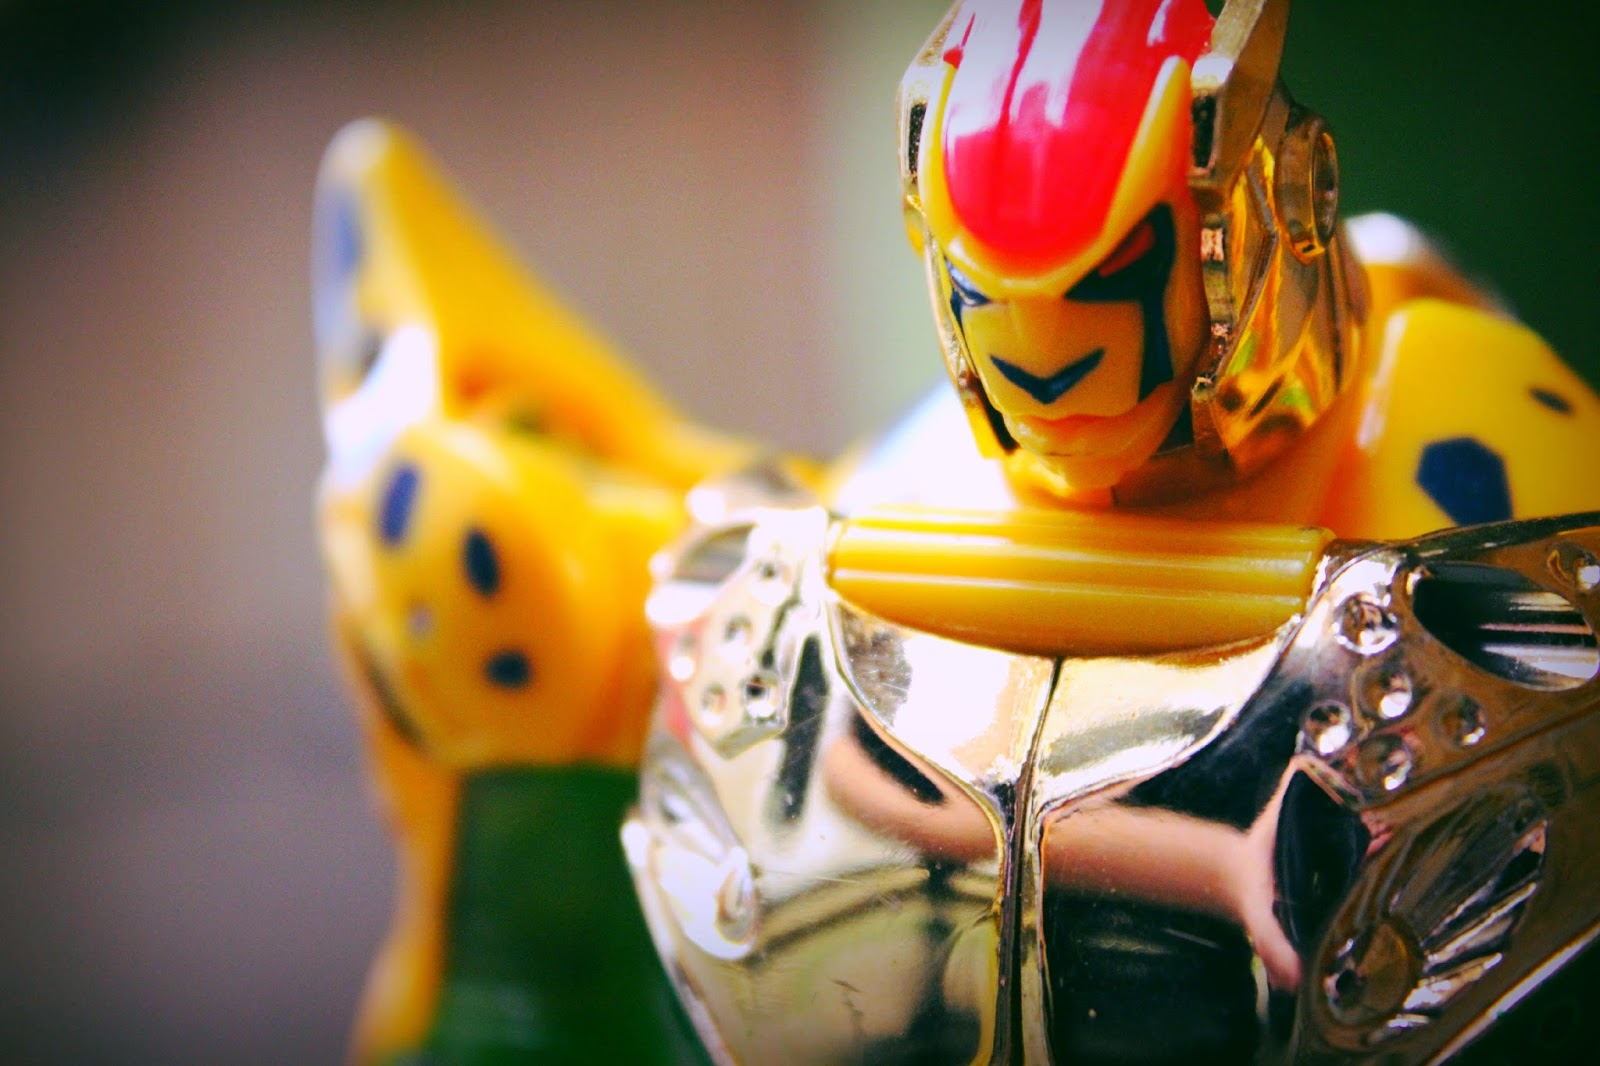 Cheetor Beast Machines Transformers Beast Wars Maximals Autobots Hasbro Mega Takara